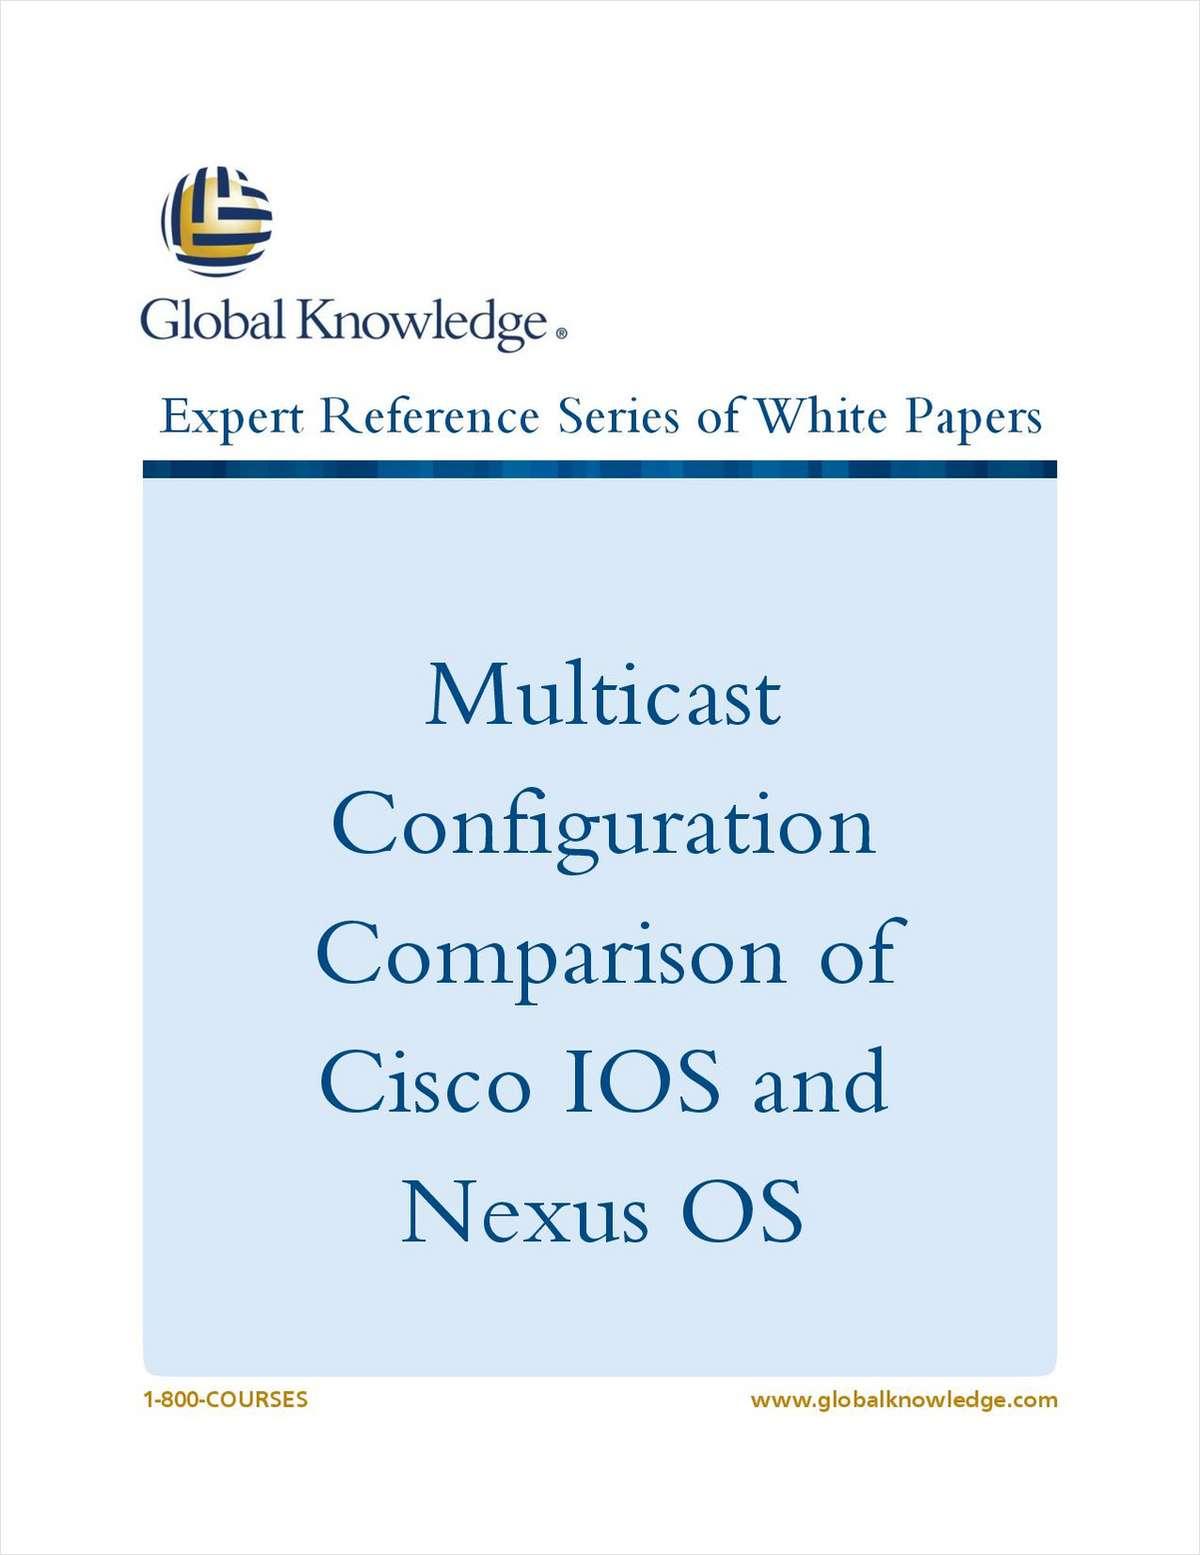 Multicast Configuration Comparison of Cisco IOS and Nexus OS